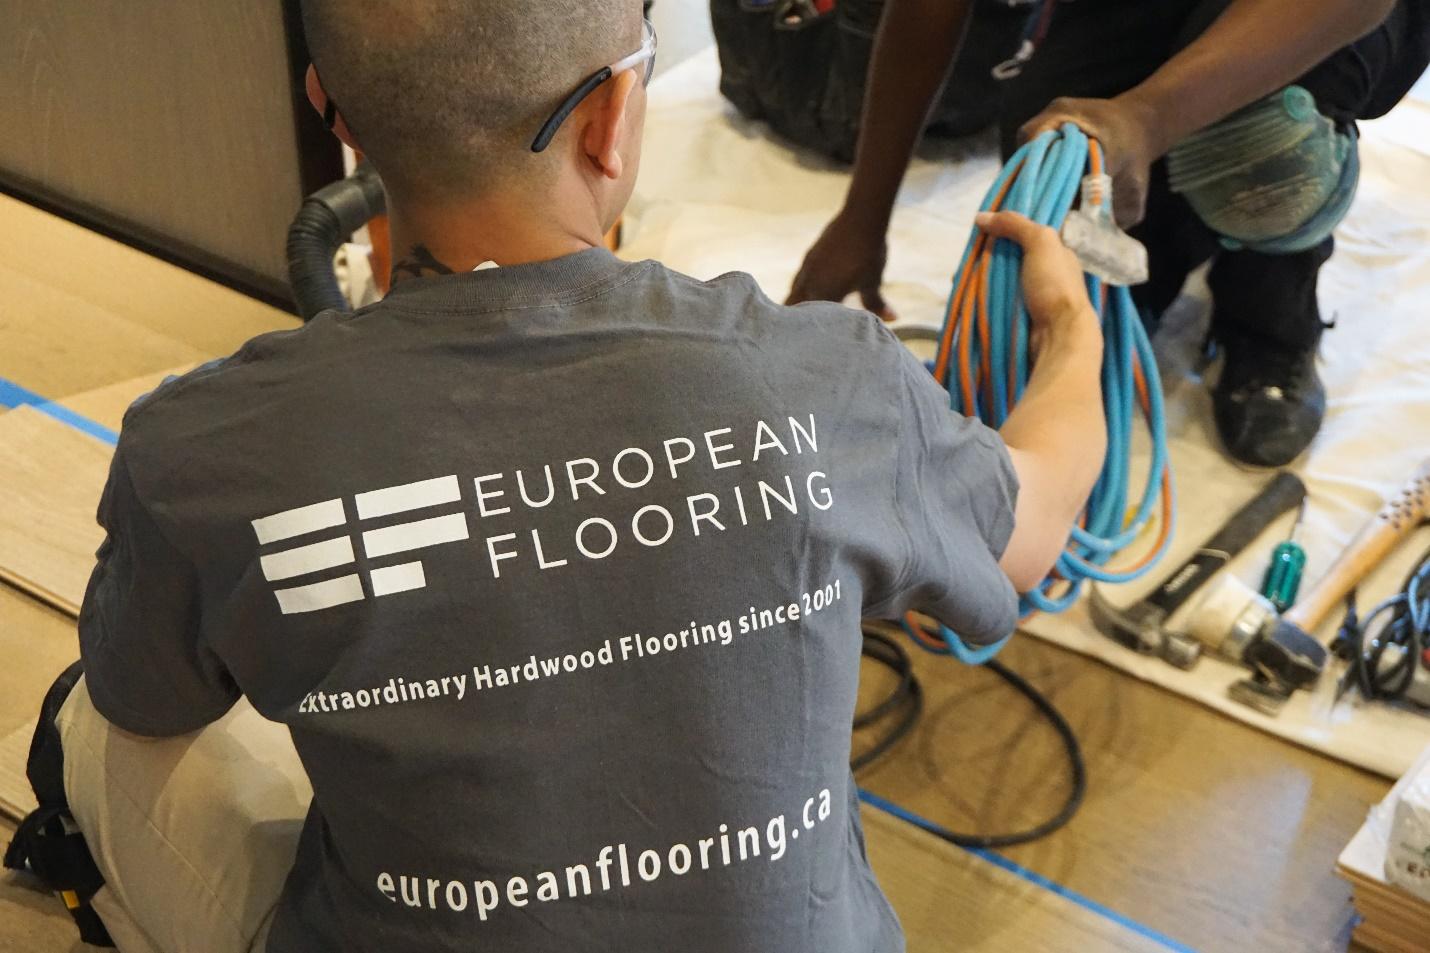 Installation hardwood Flooring